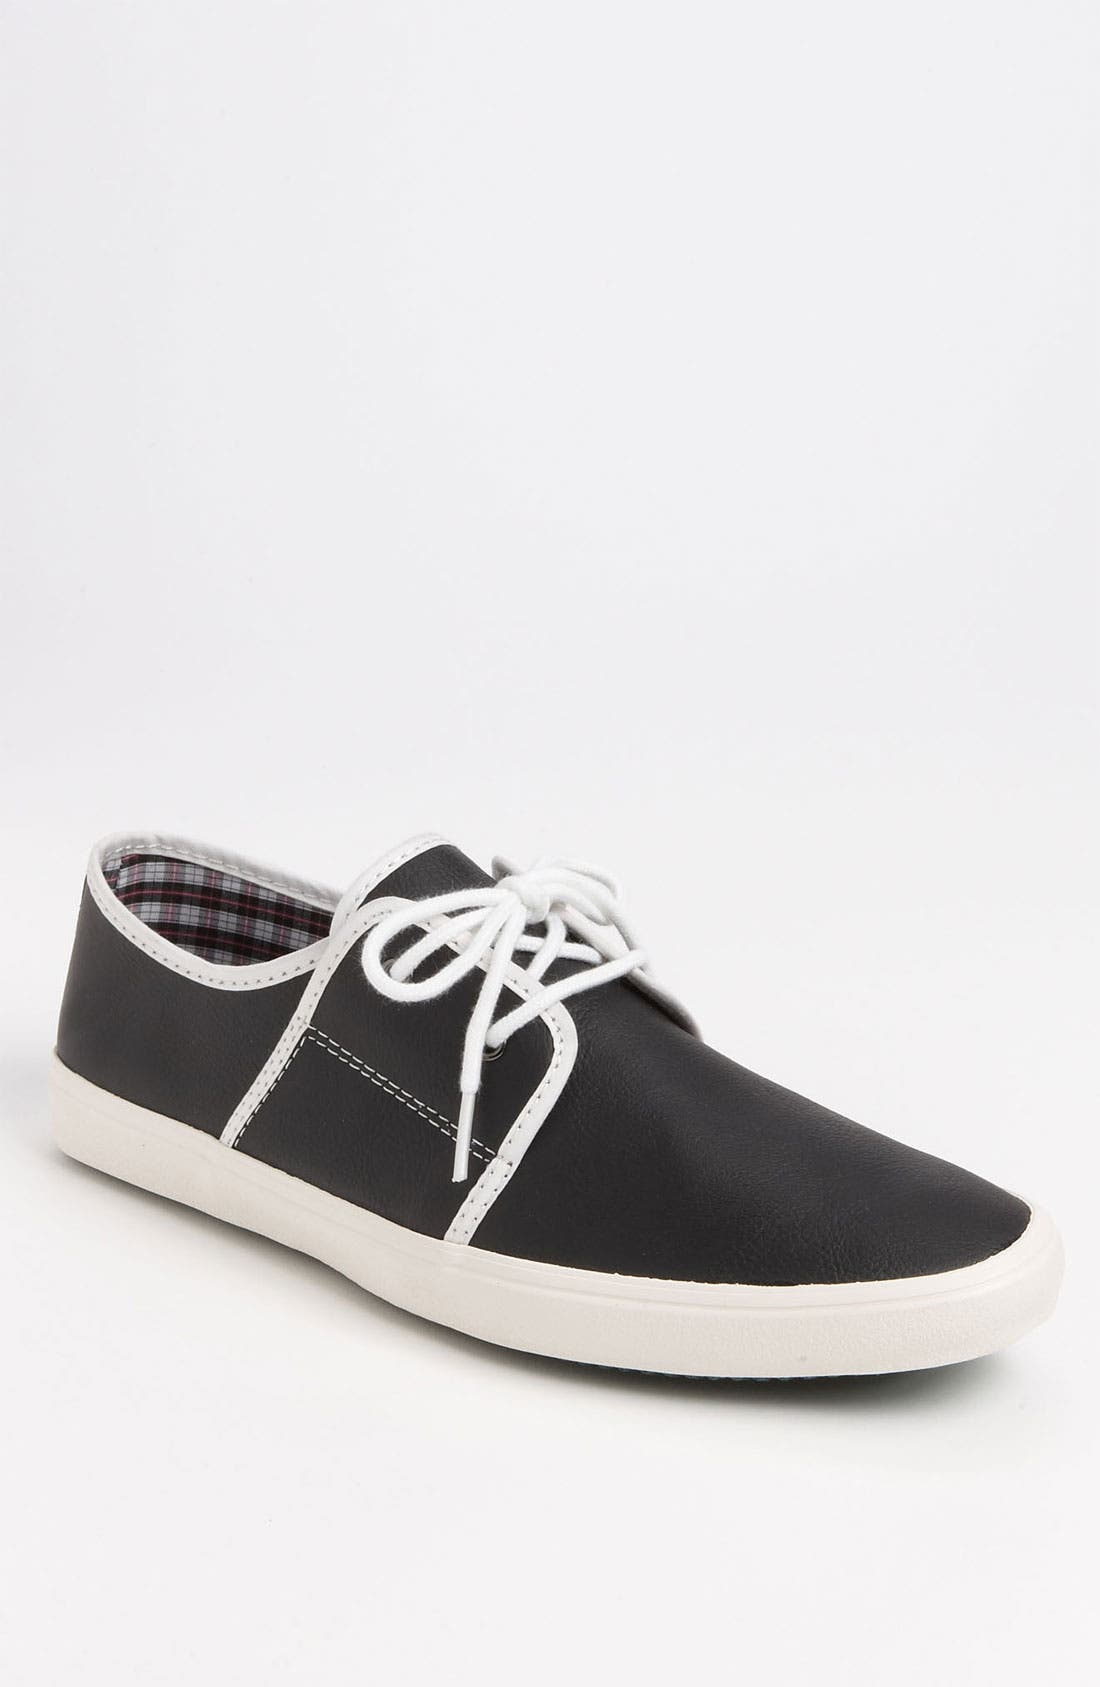 Alternate Image 1 Selected - ALDO 'Strasters' Sneaker